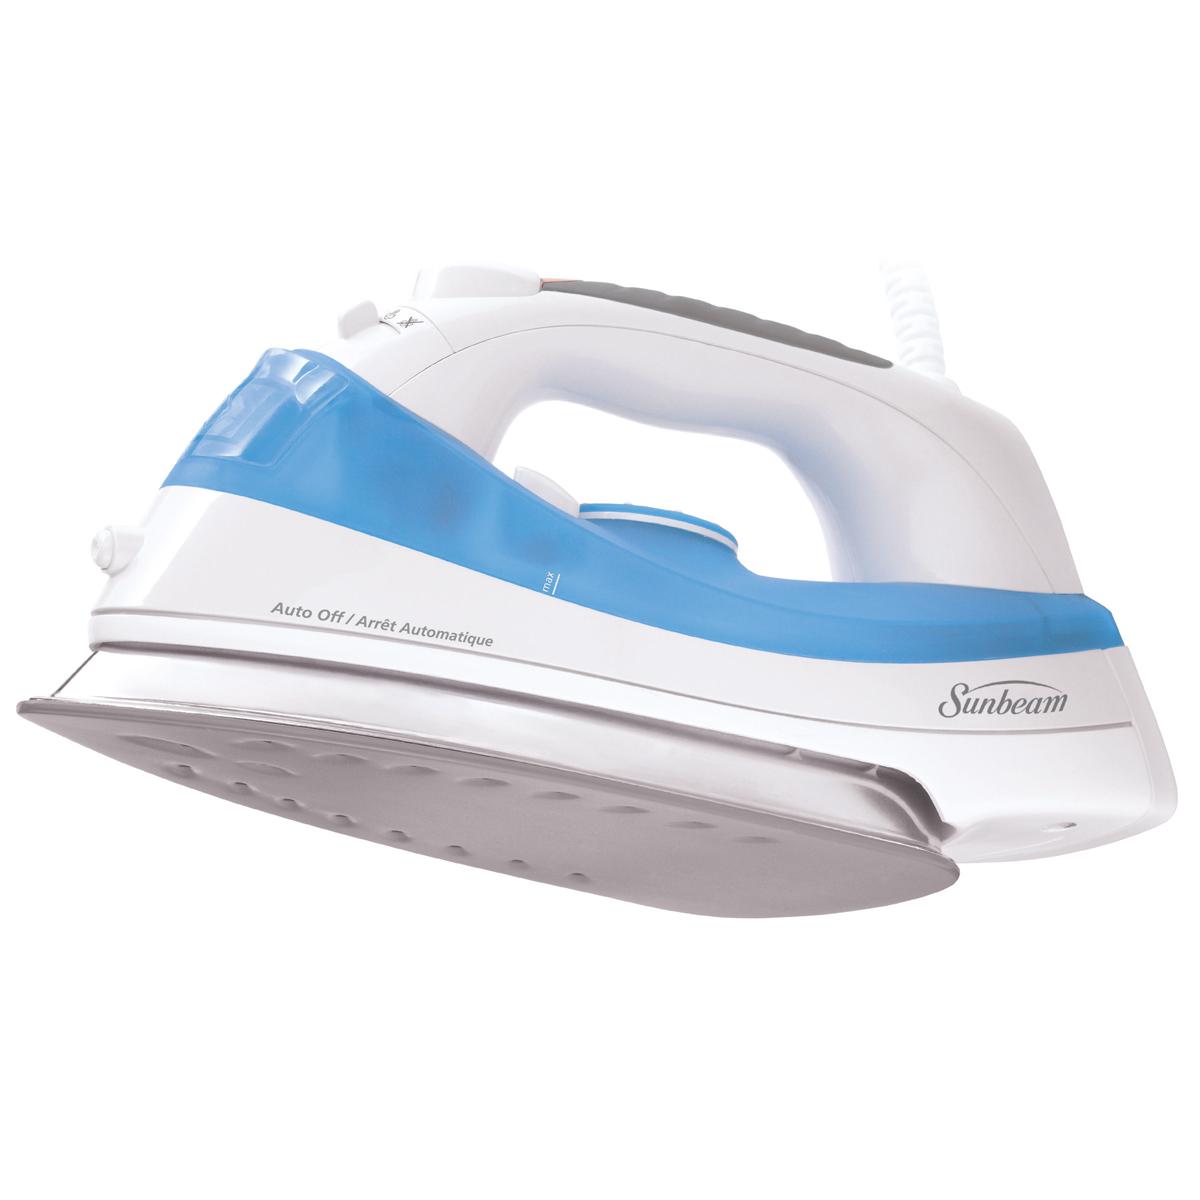 Sunbeam® Steam Master® Iron, White & Blue